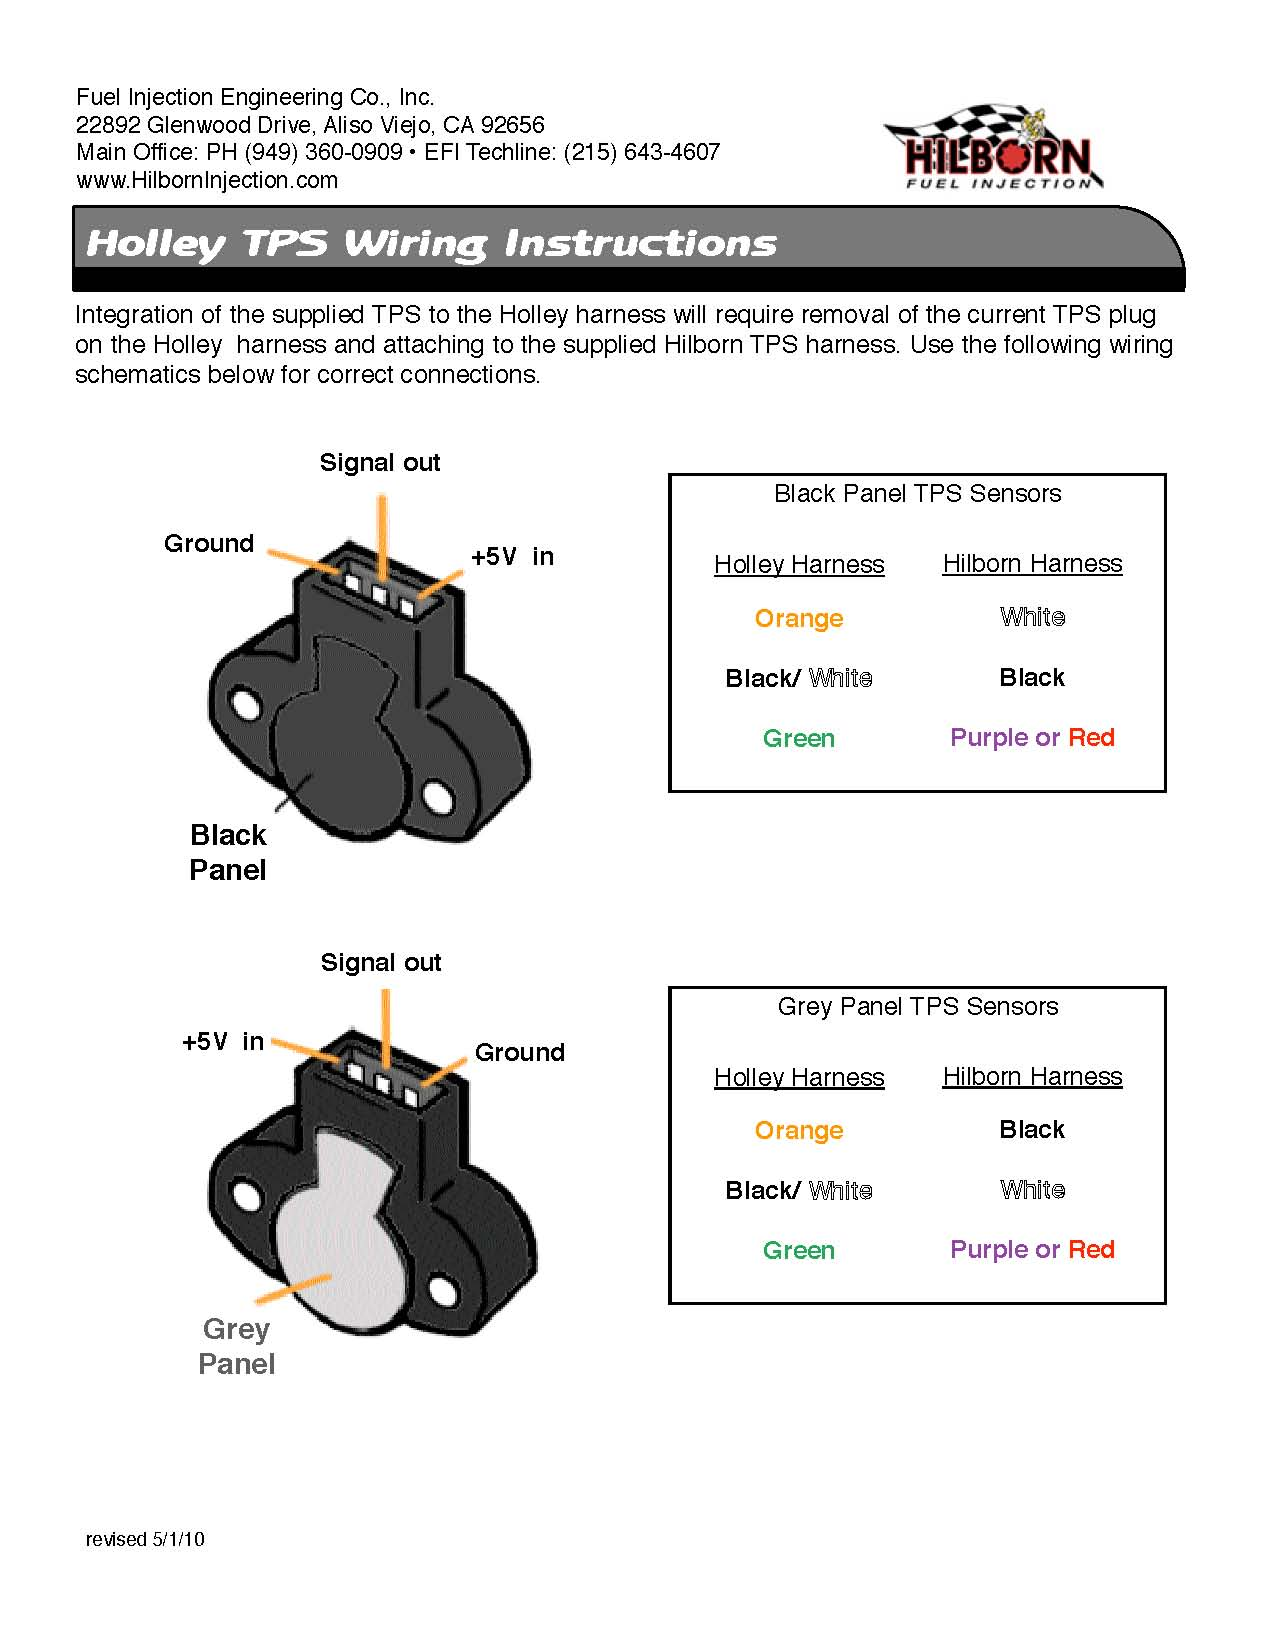 Holley clipart green Wiring schematic Holley Hilborn –